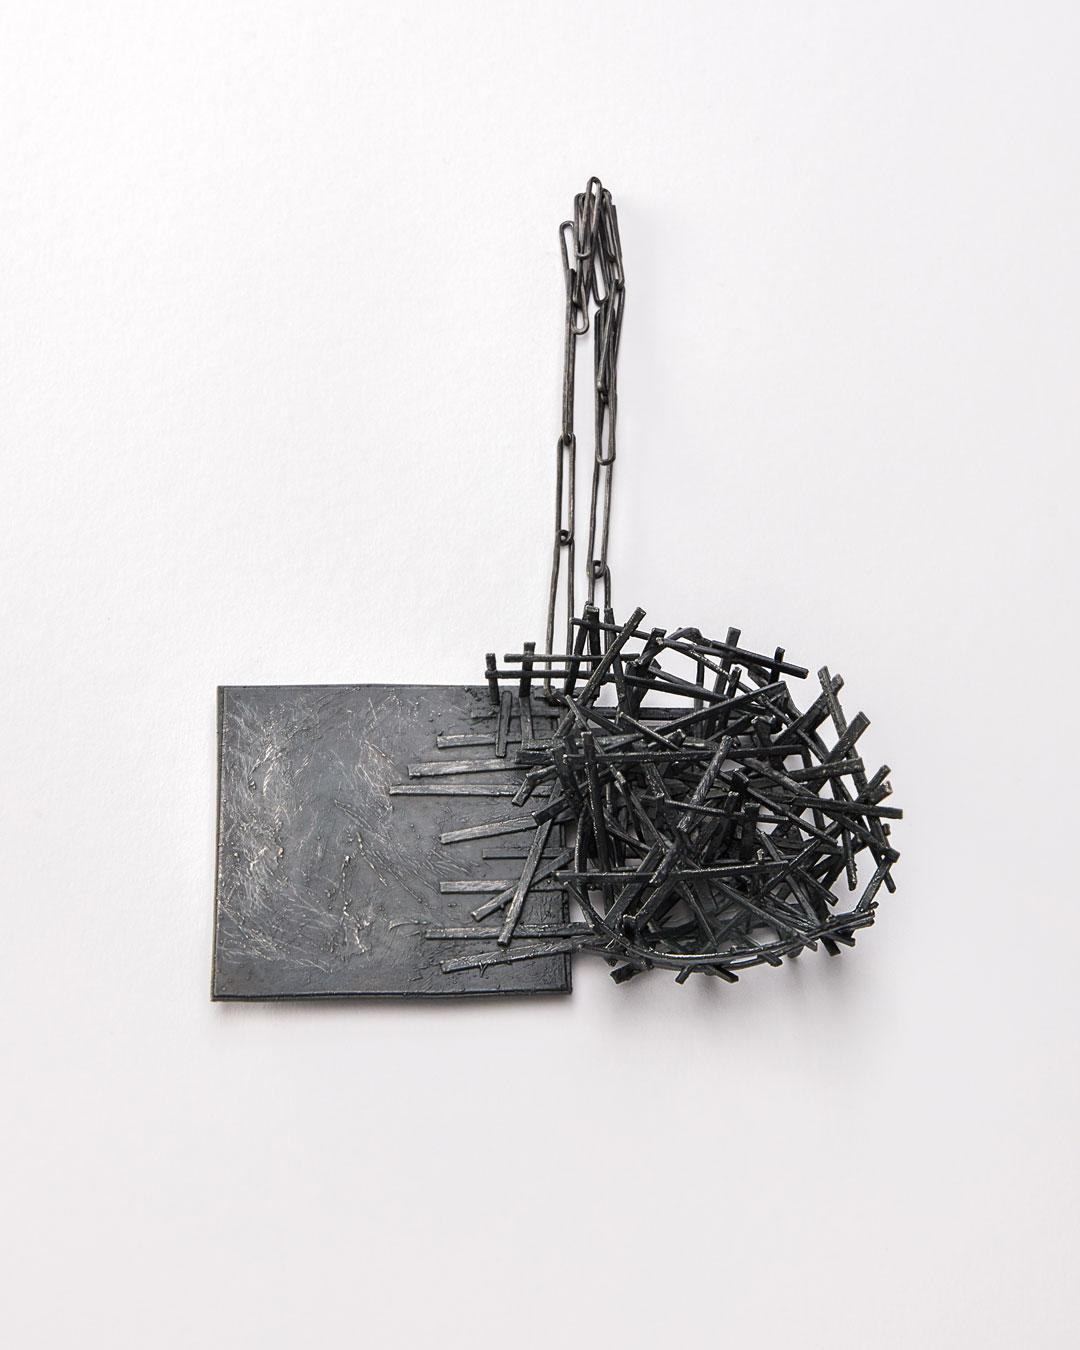 Iris Bodemer, Gegenüberstellung 1 (Juxtaposition 1), 2019, pendant; silver, thermoplastic, 90 x 140 x 40 mm, €4250